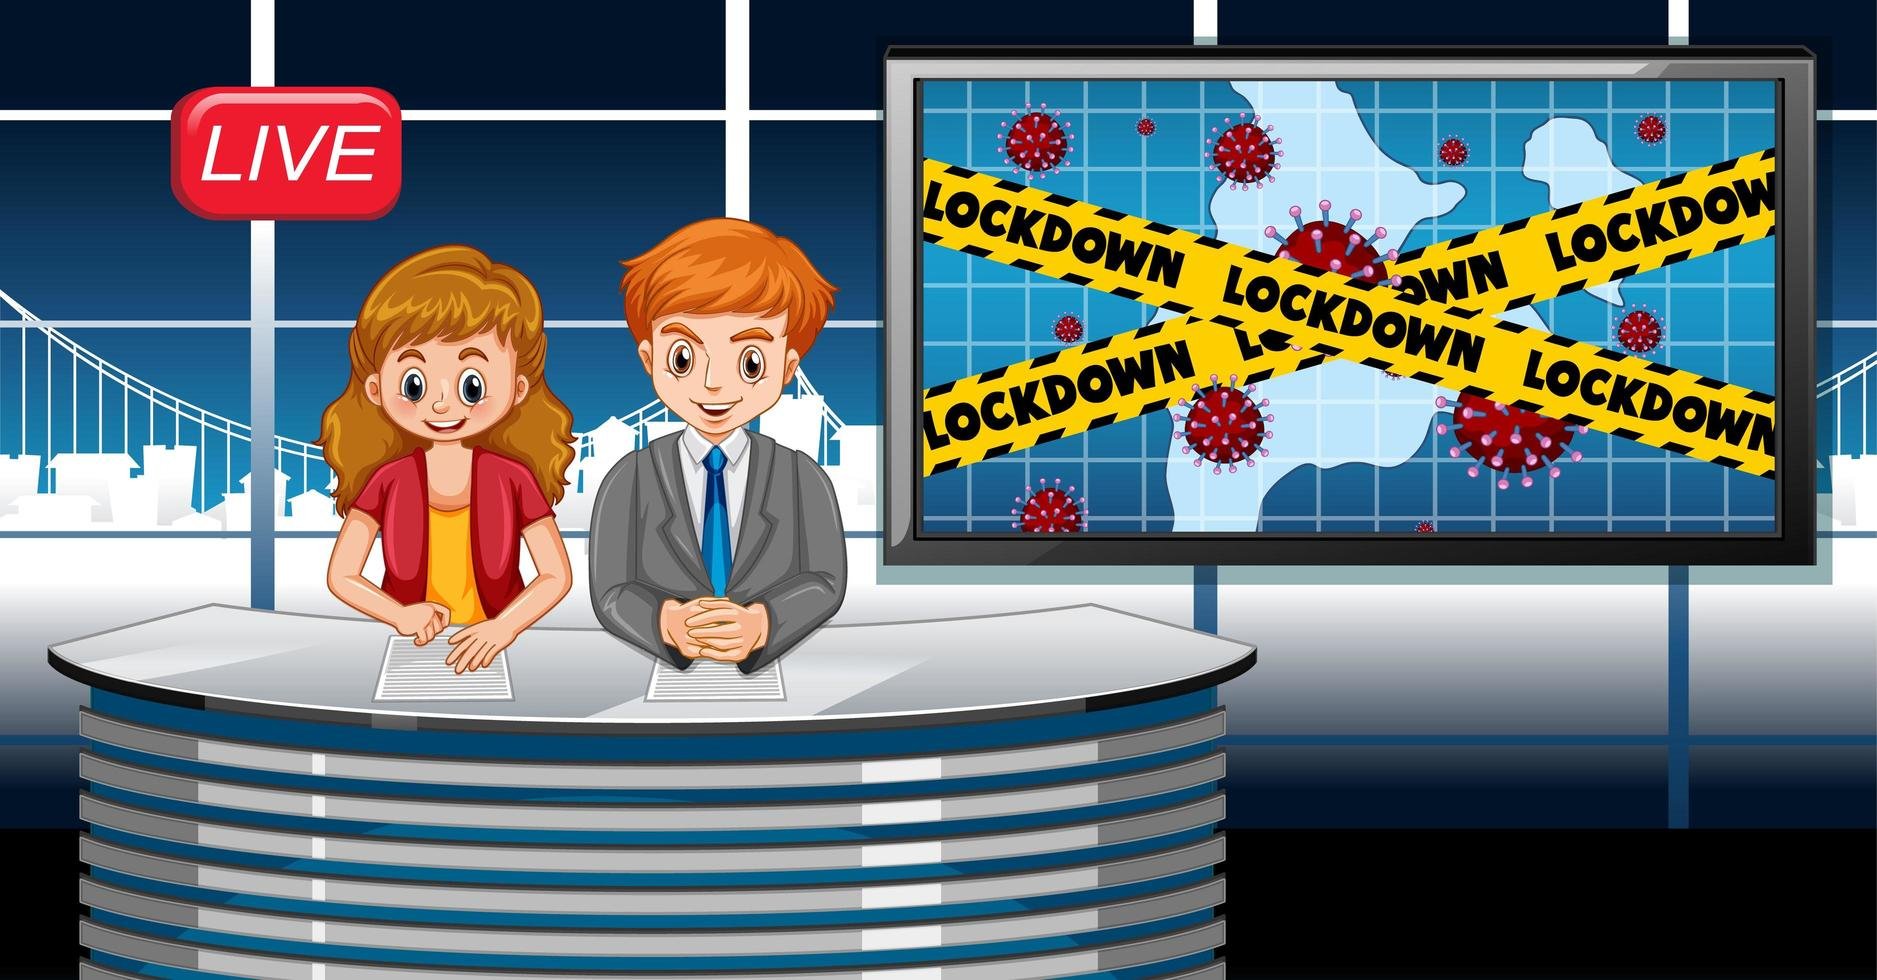 conception d'affiche de coronavirus avec newsreporter en direct en studio vecteur